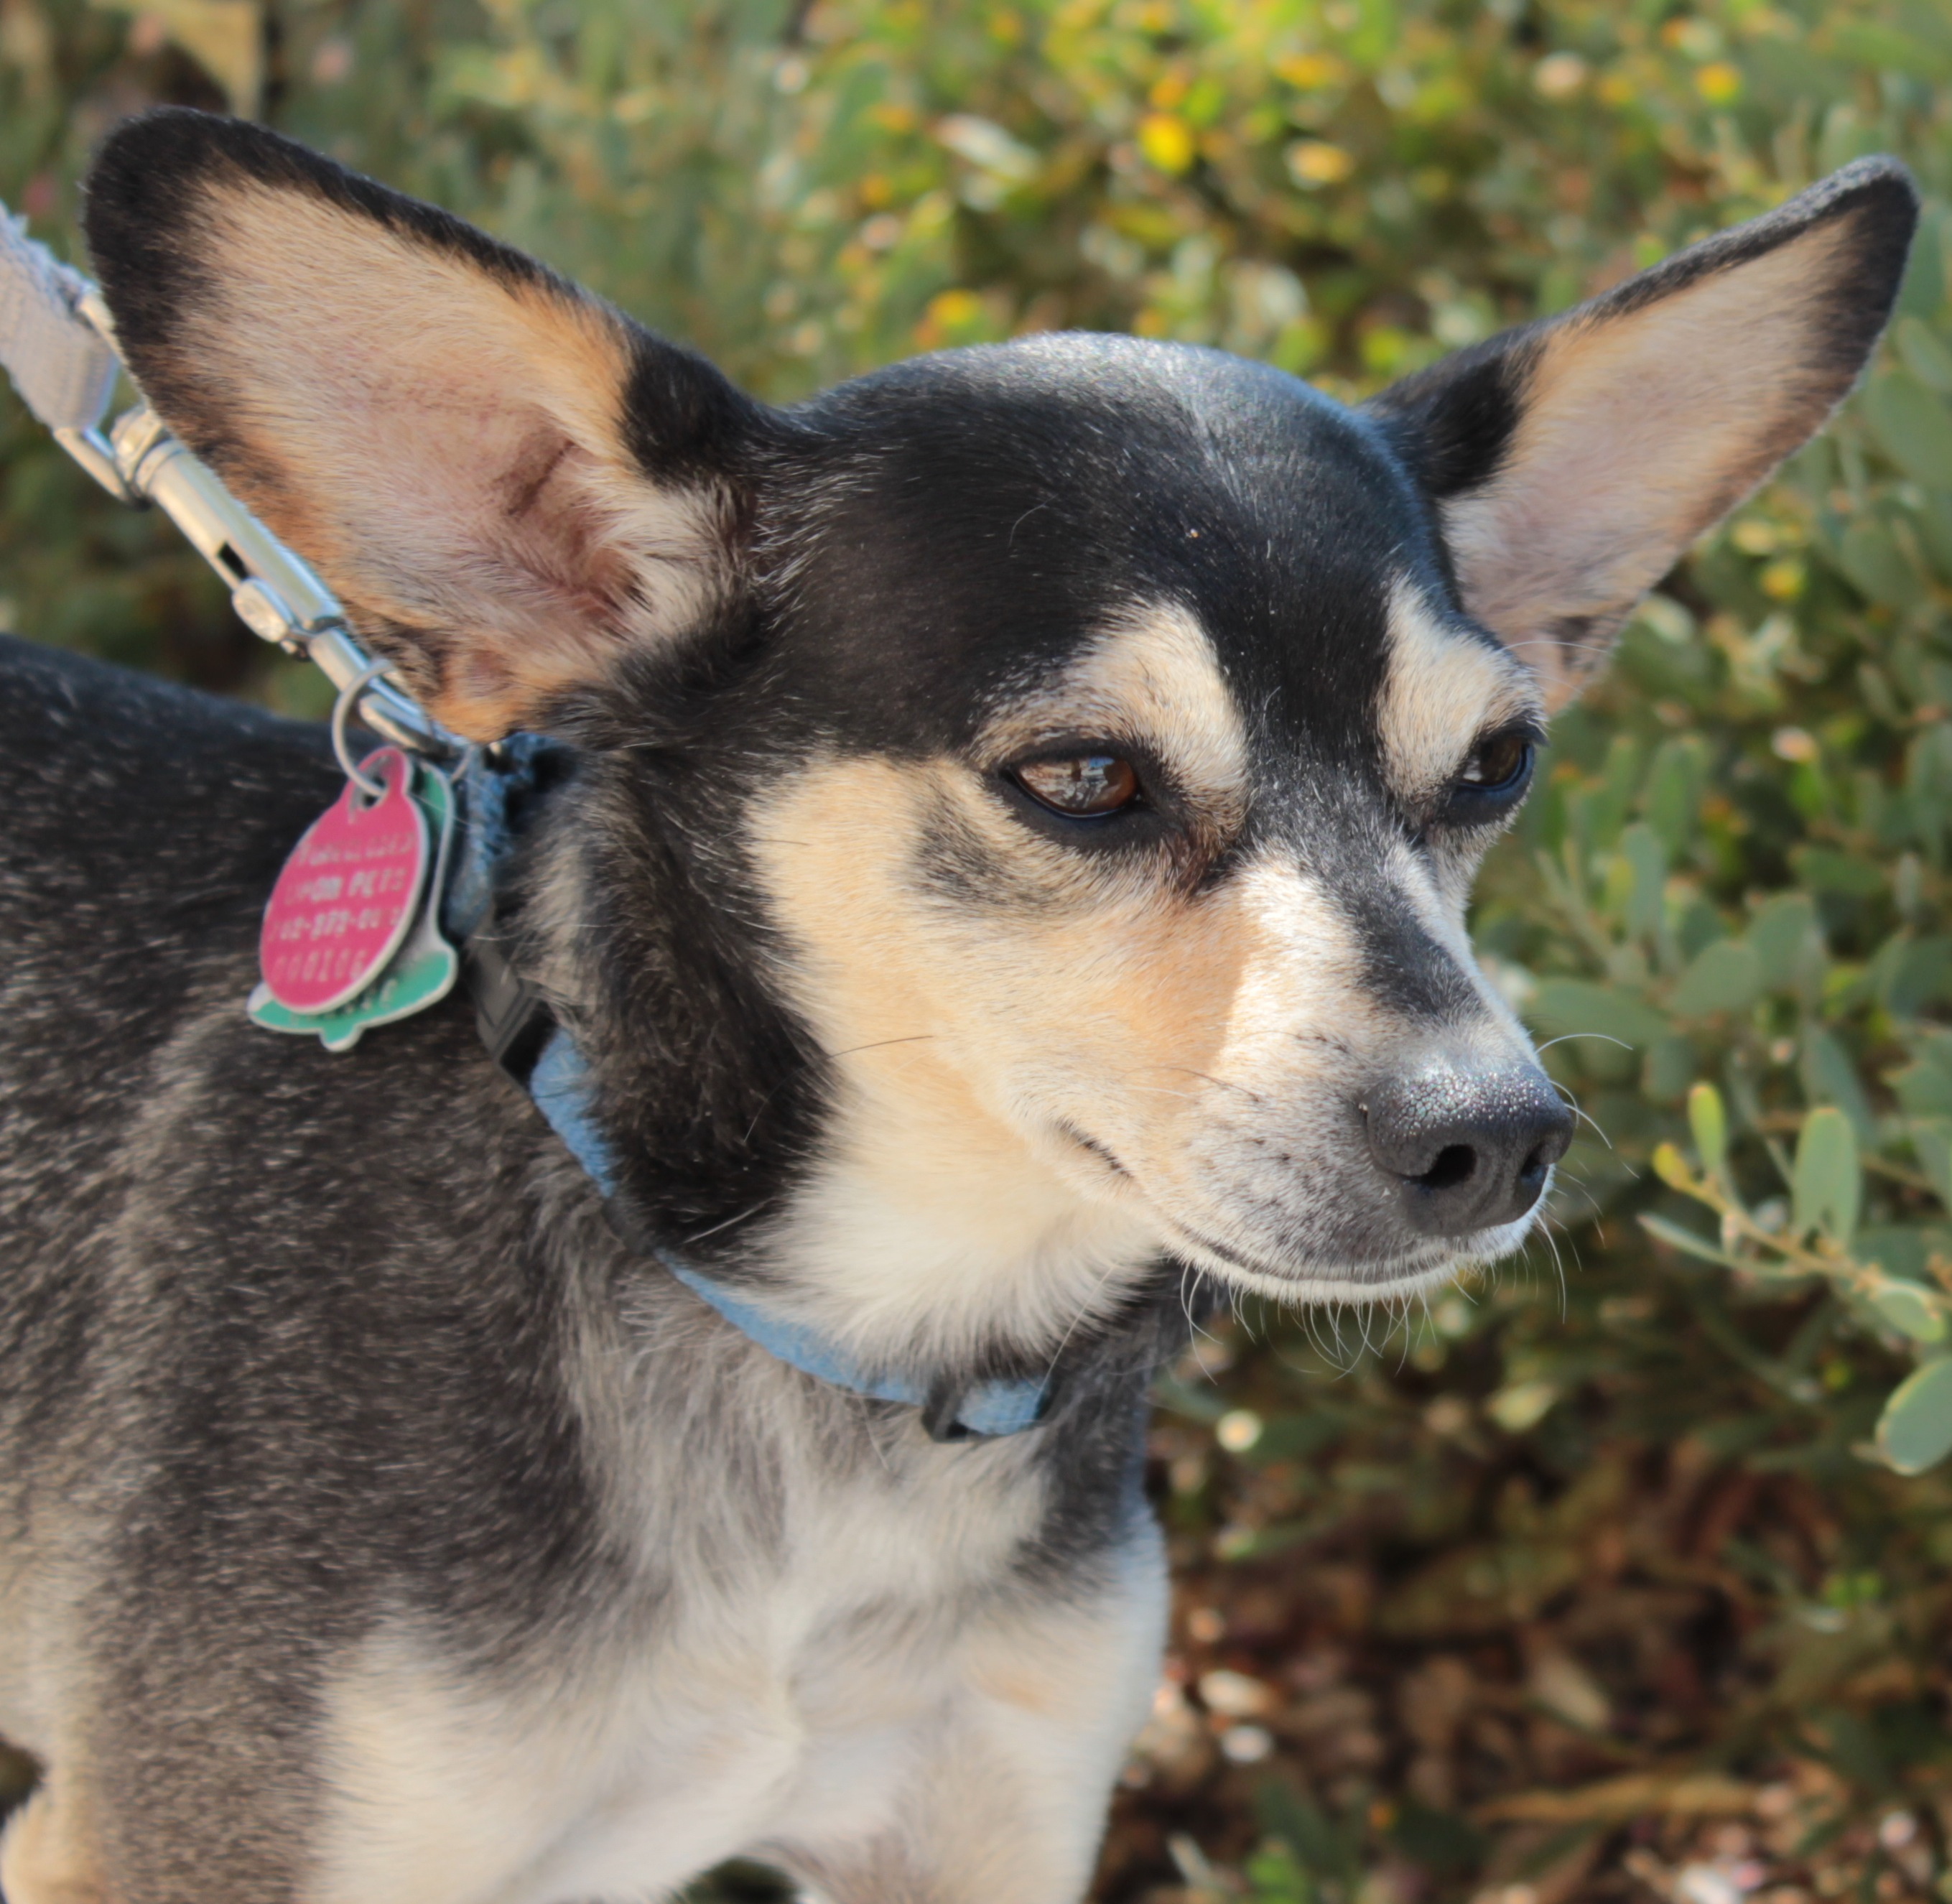 Invigorating Romeo Romeo Pin Mix Adopted Foreclosed Upon Pets Chihuahua Corgi Dachshund Mix Corgi Chihuahua Mix Shedding bark post Chihuahua Corgi Mix